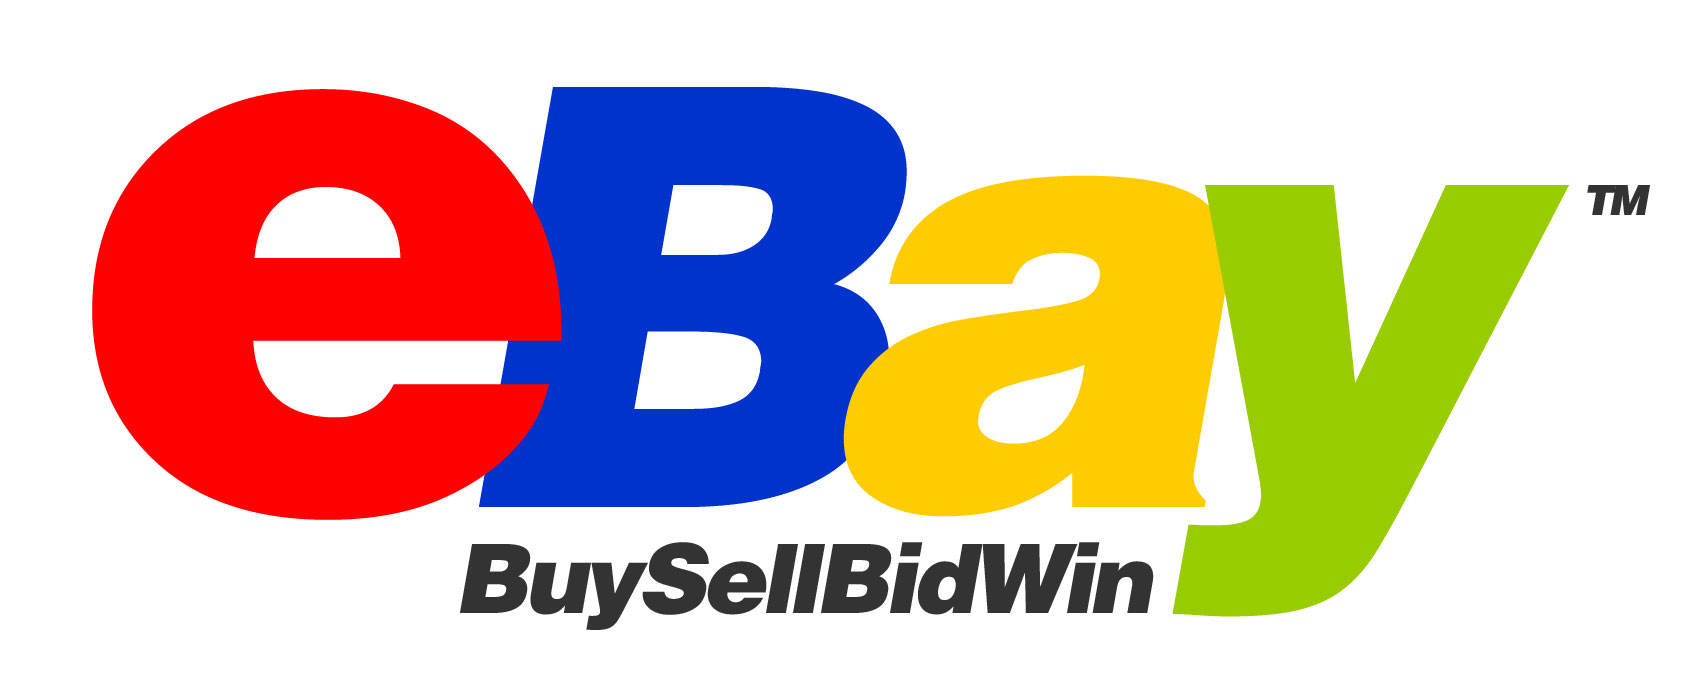 ebay logo - Ebay Logo Vector PNG